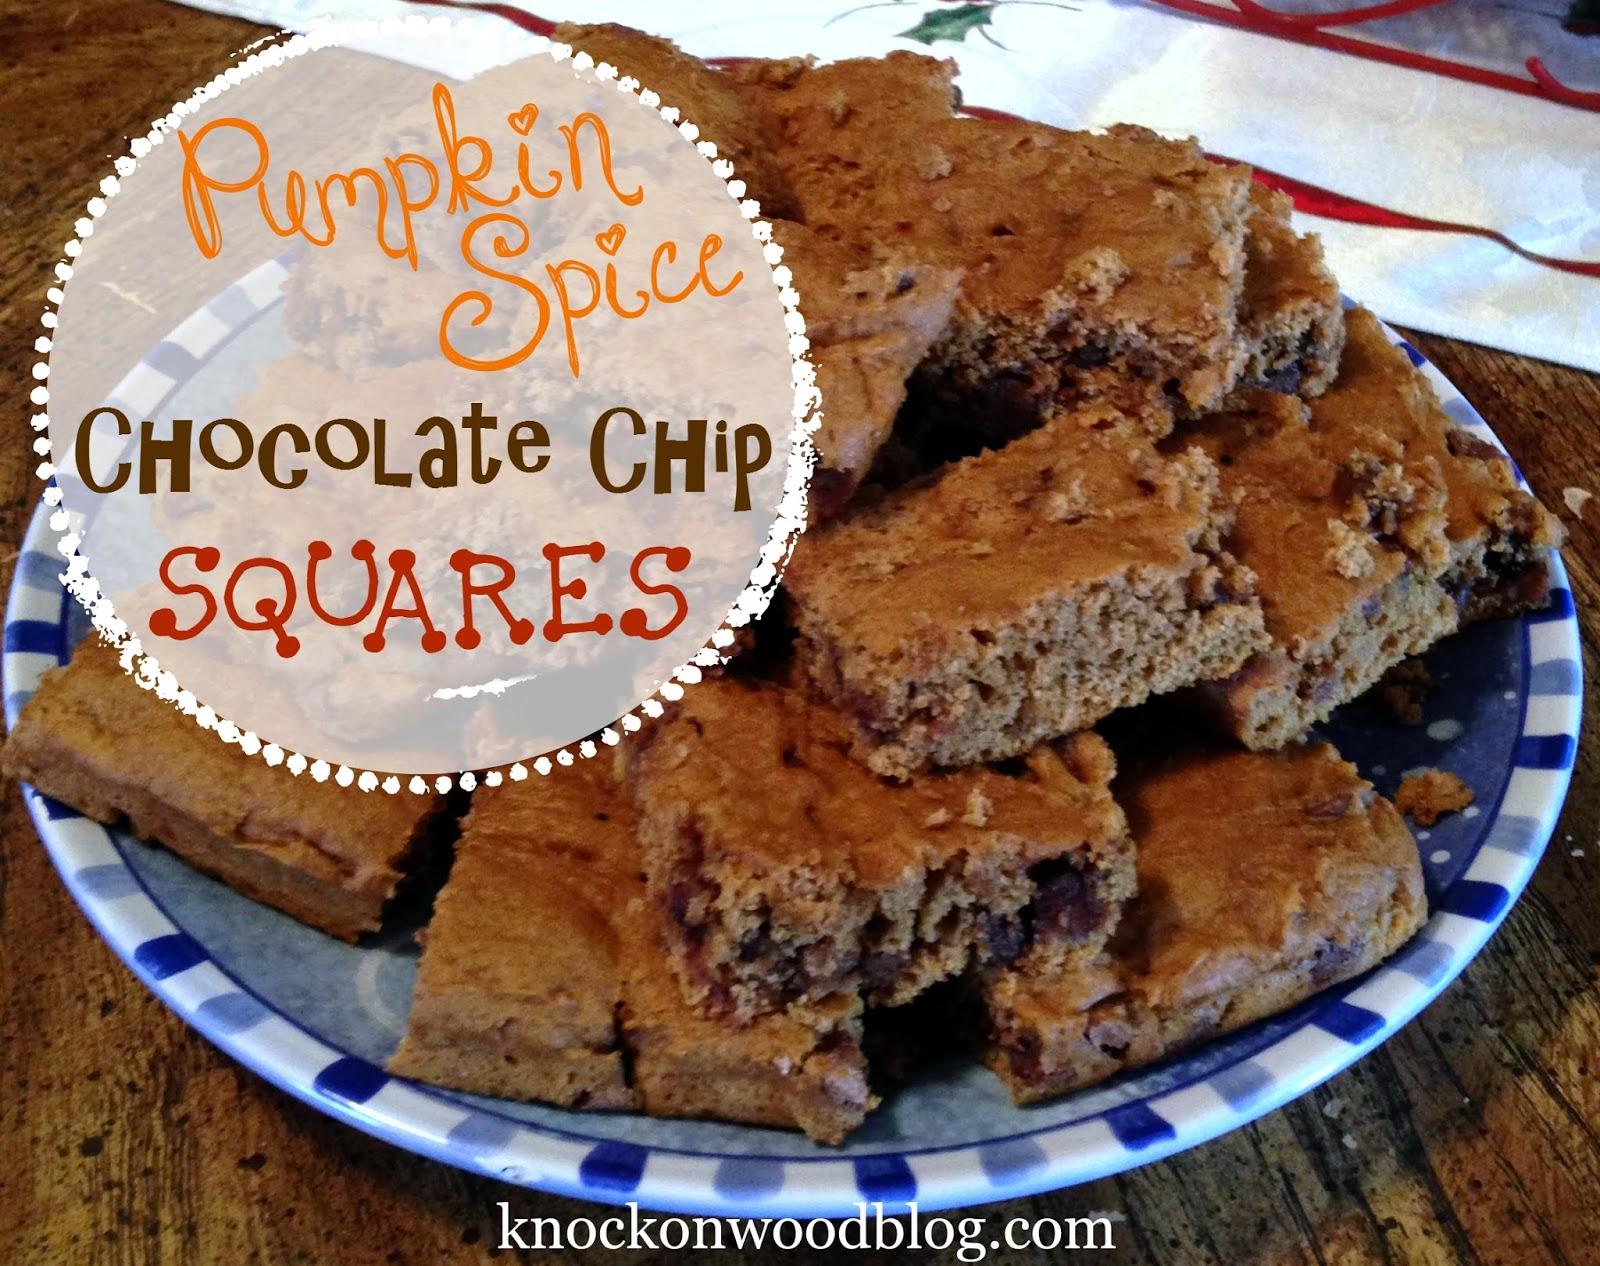 Recipe for Pumpkin Spice Chocolate Chip Dessert Squares